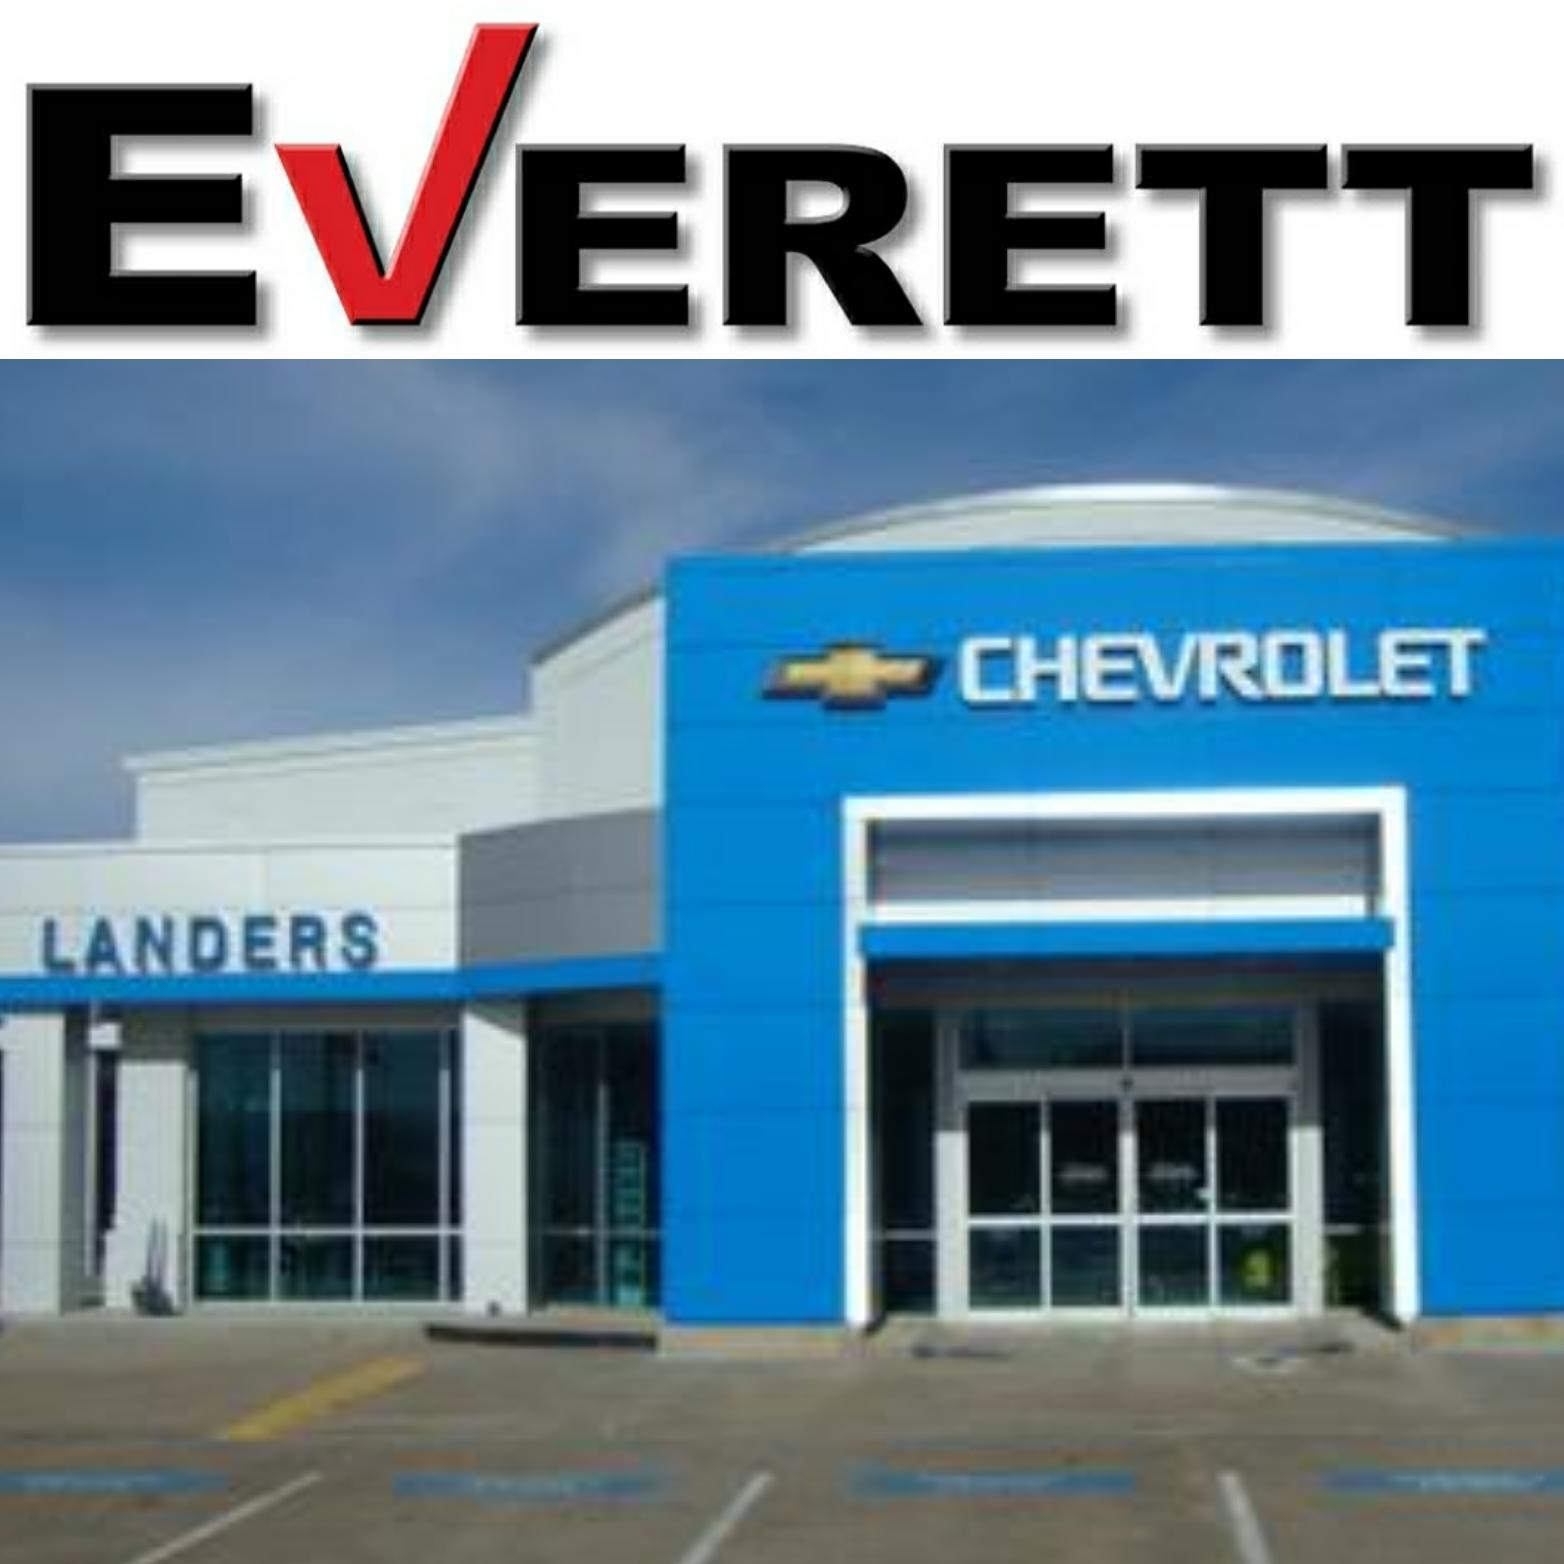 Everett Buying Landers Chevrolet